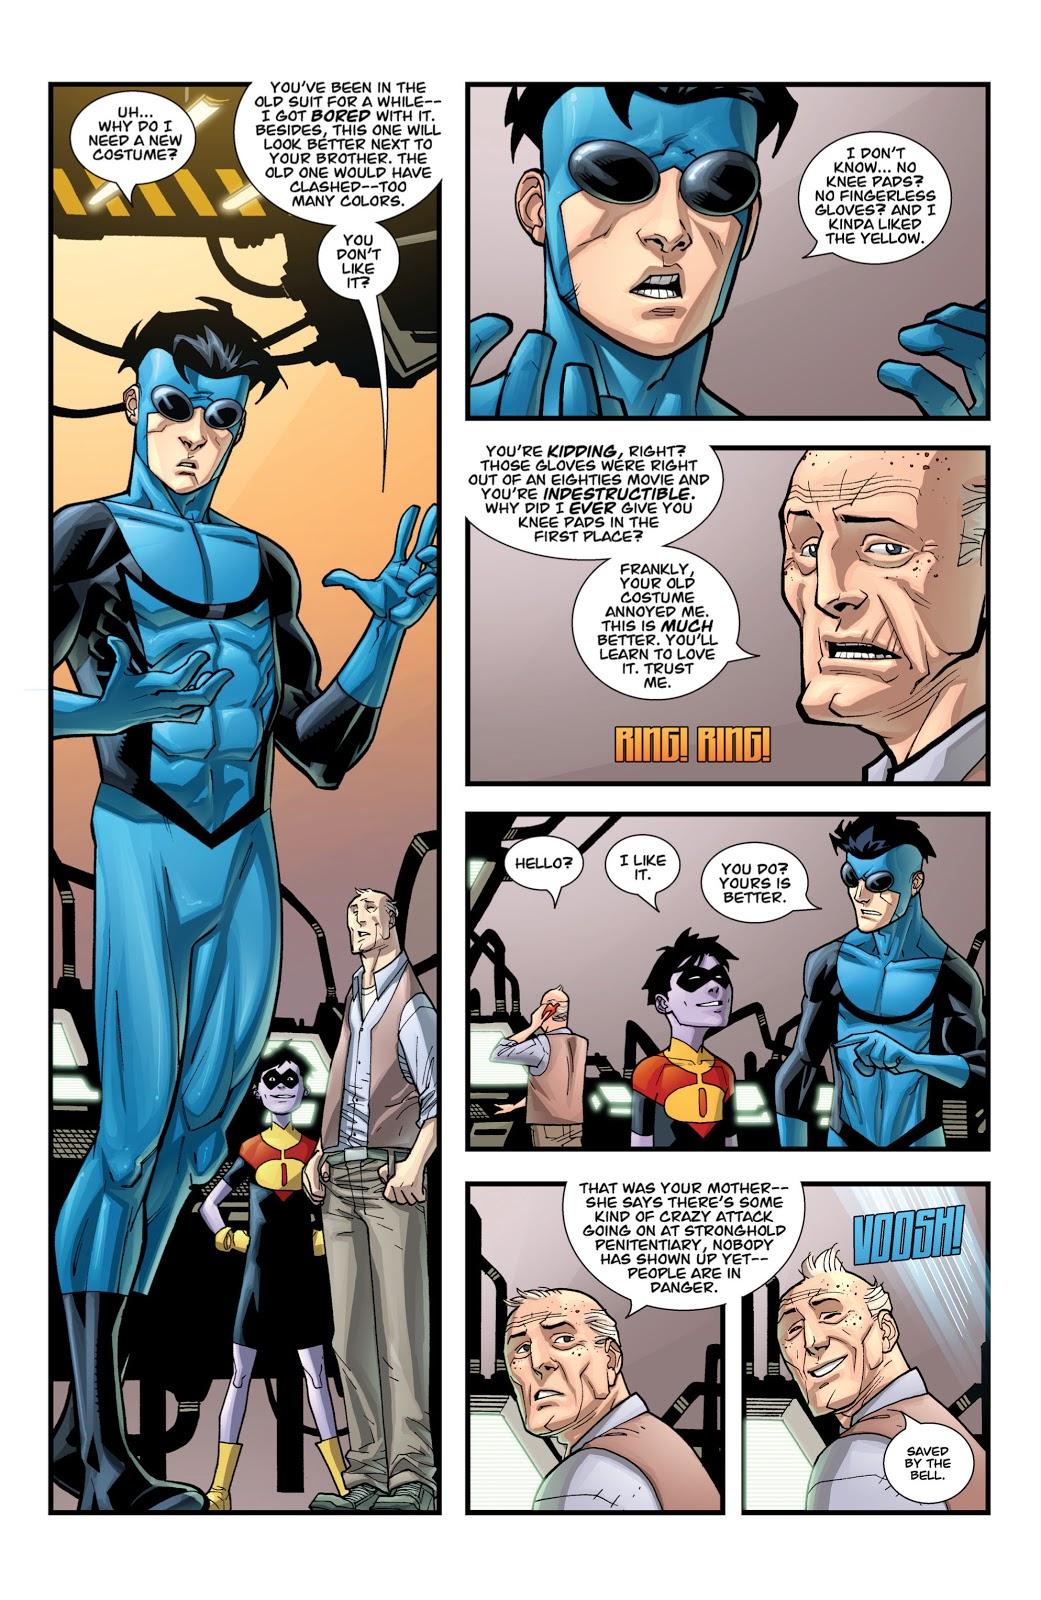 Why Invincible Got A Blue Costume